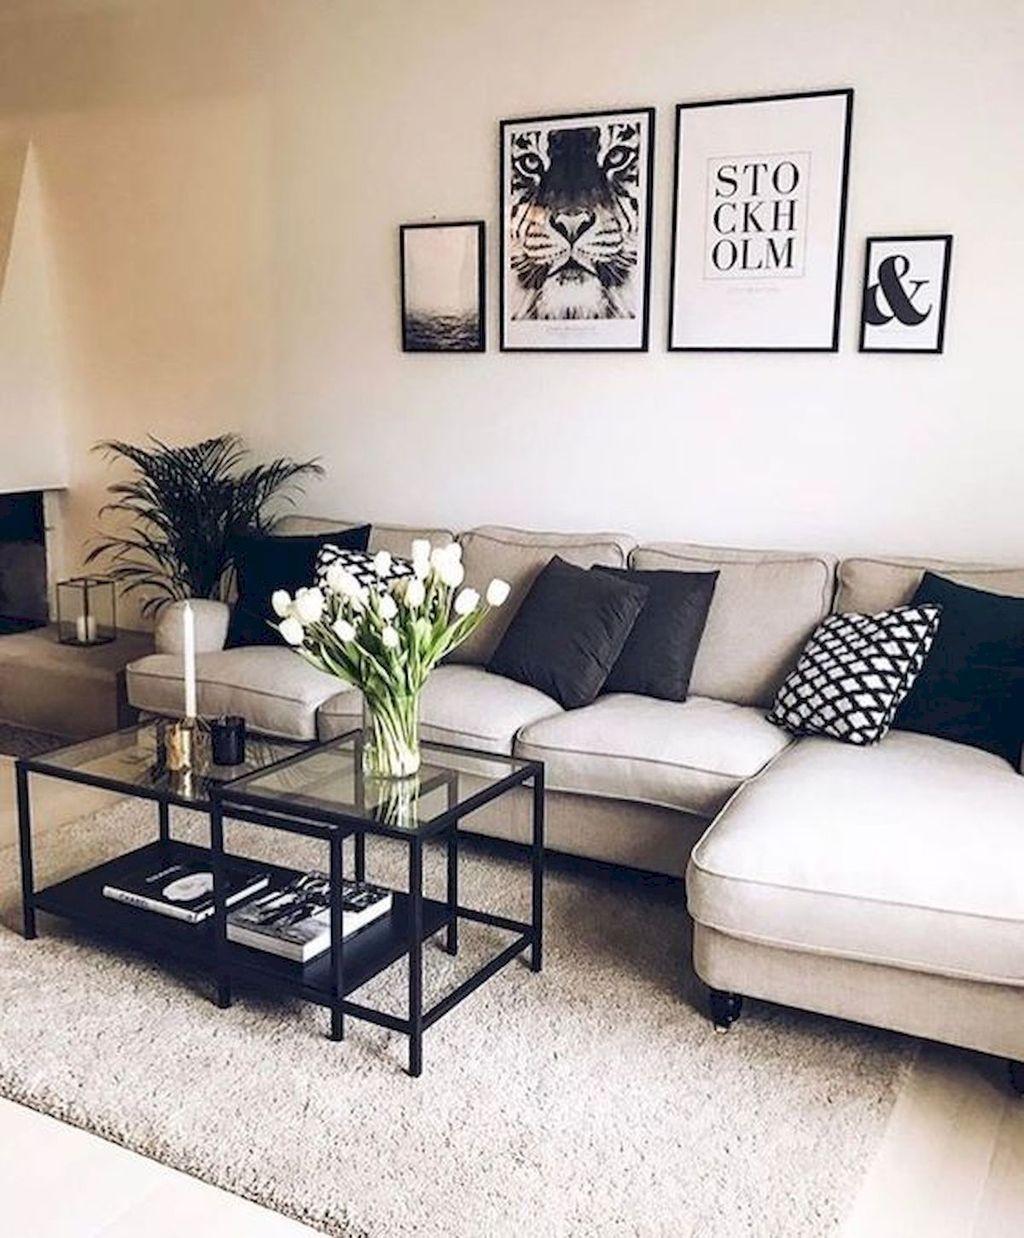 The Best Living Room Decorating Ideas Trends 2019 50 Pimphomee Living Room Decor Apartment Minimalist Living Room Decor Minimalist Living Room Best living room ideas